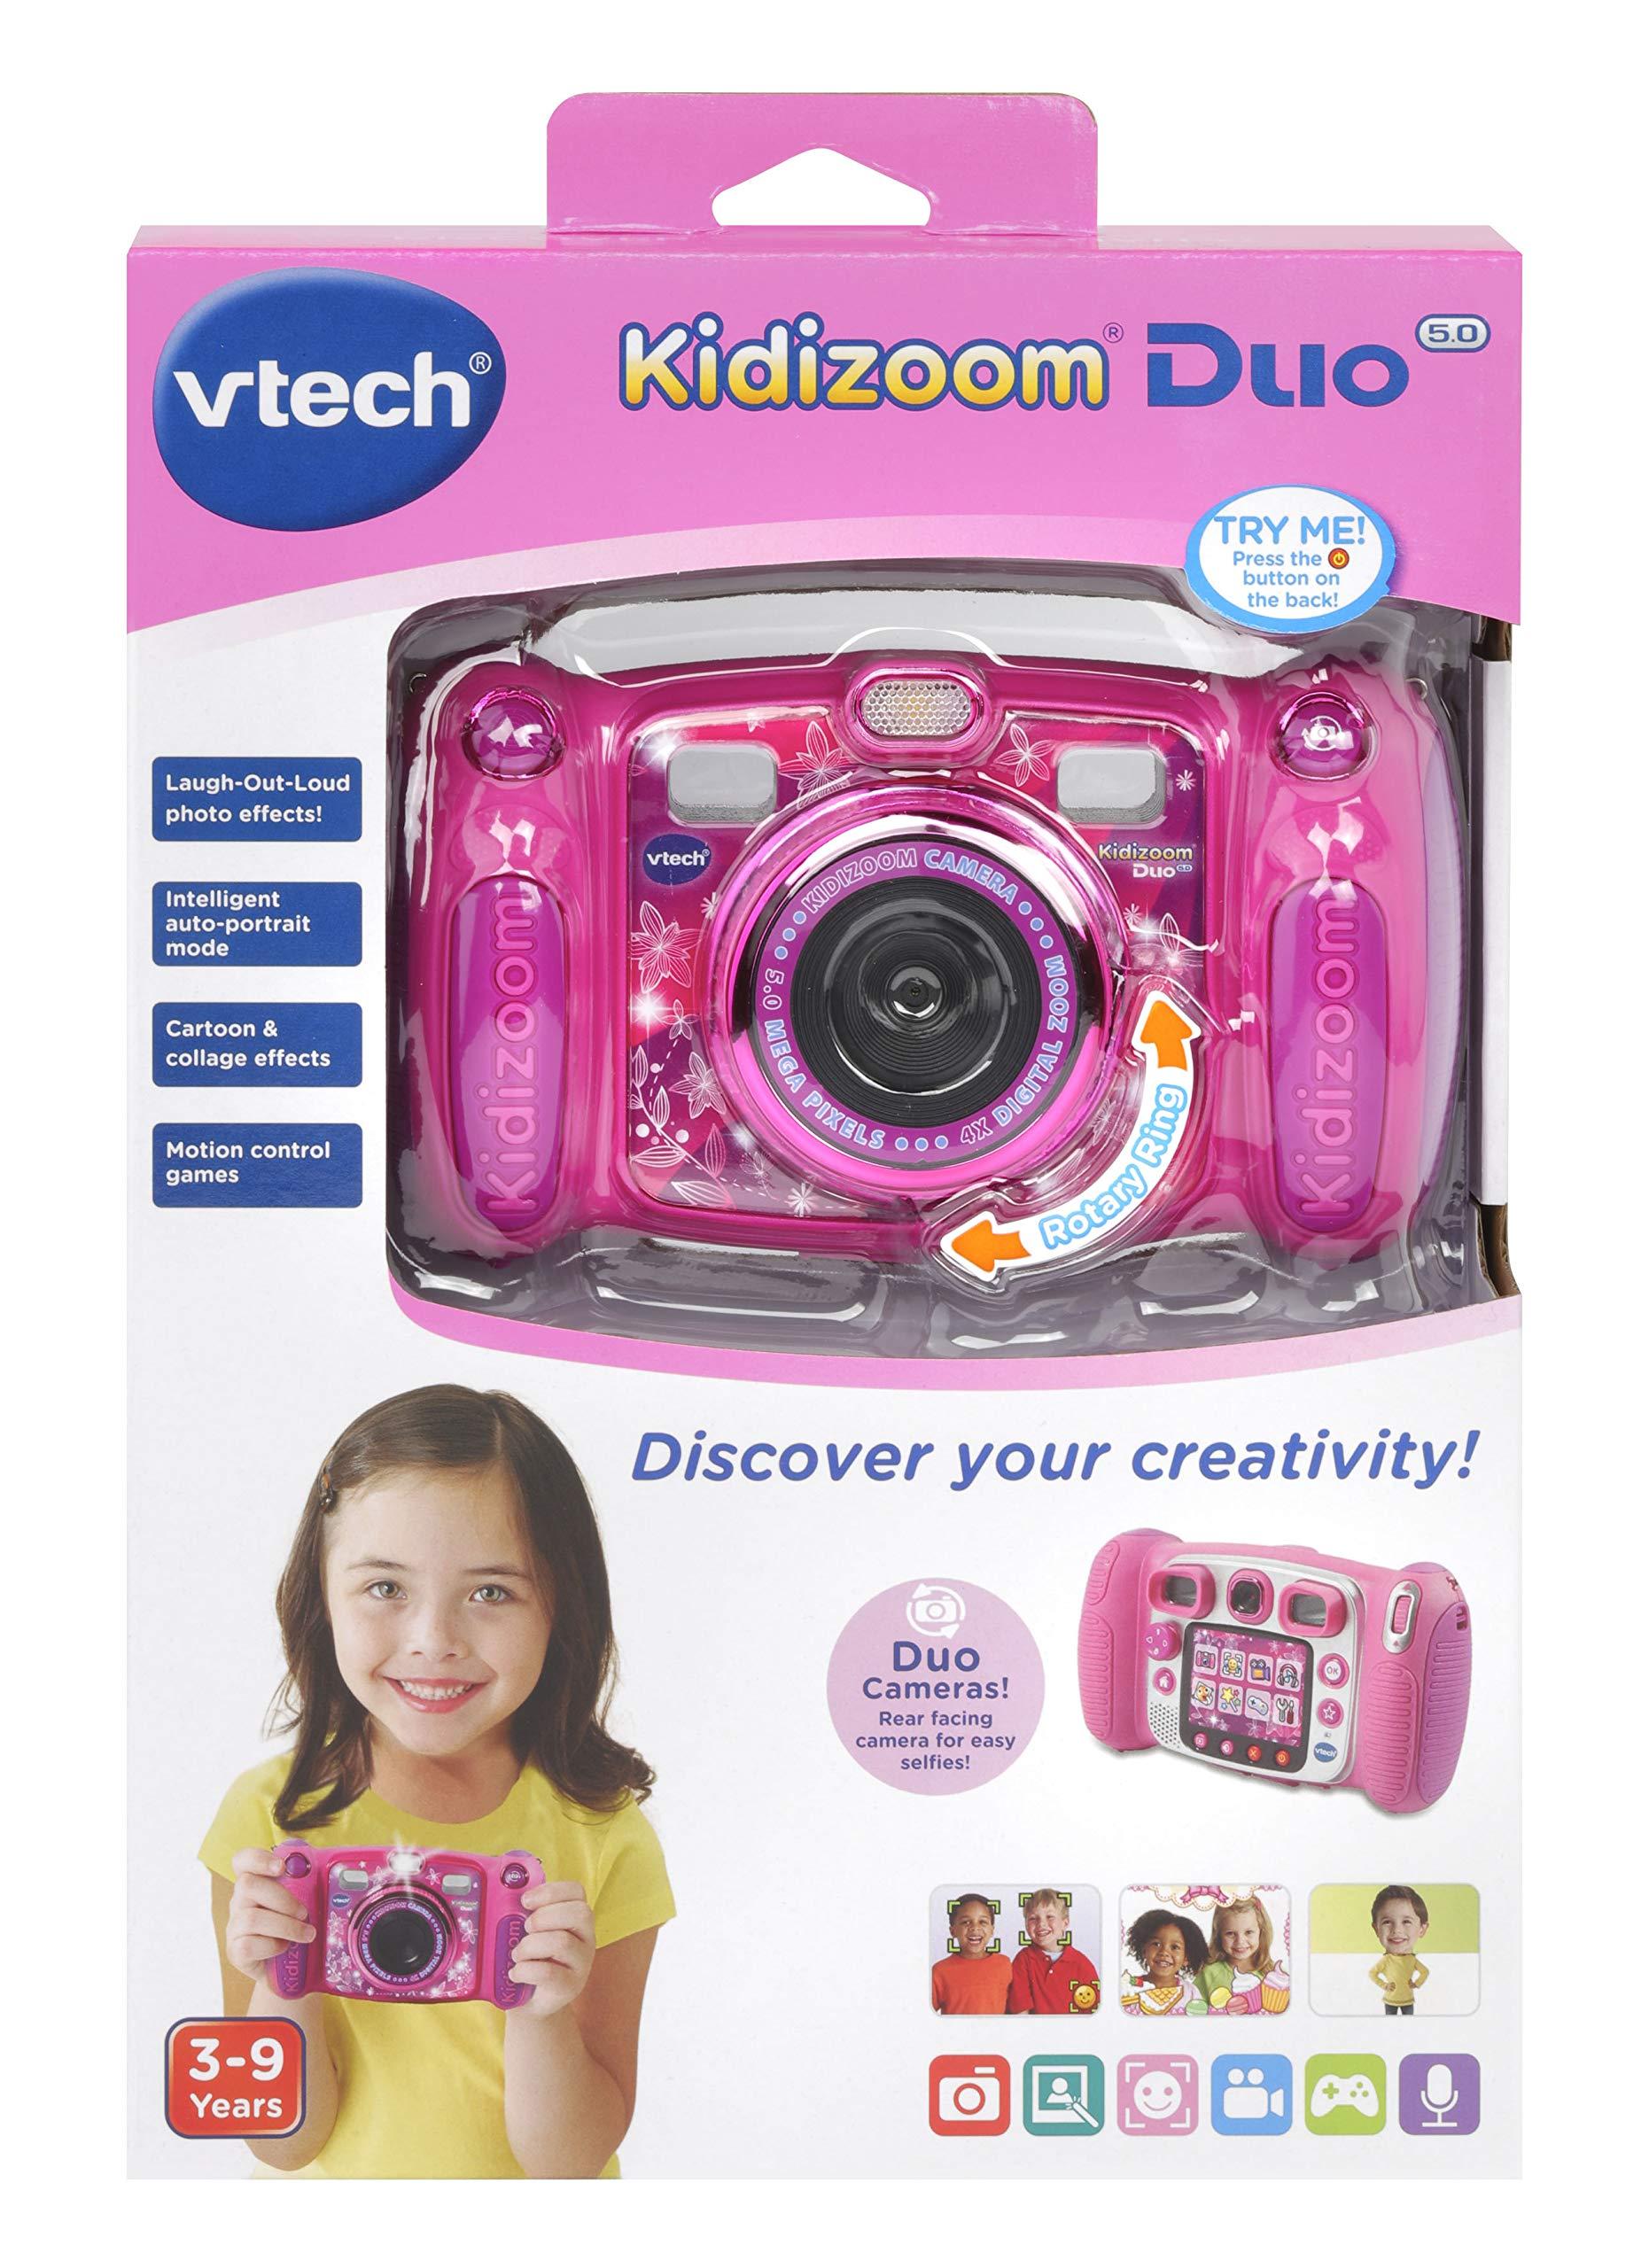 VTech Kidizoom Duo 5.0 Camera Pink by VTech (Image #4)